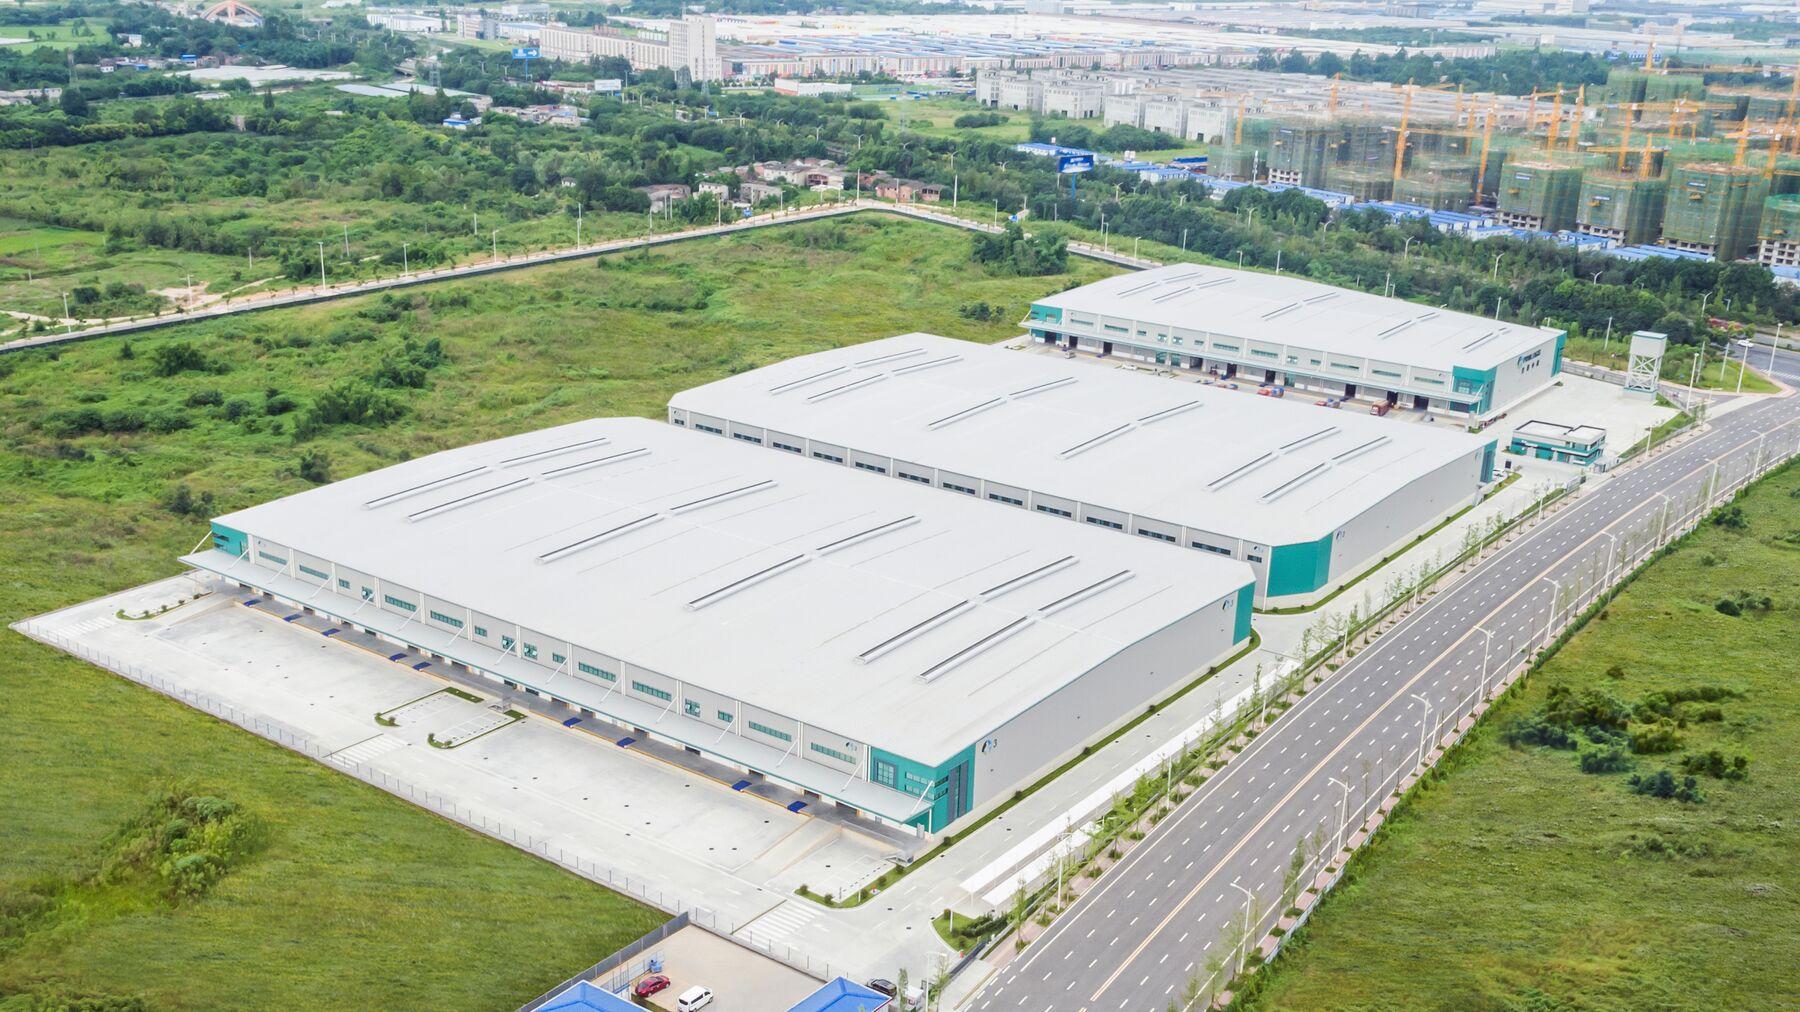 DPM-Prologis-Chengdu-Qingbaijiang-Logistics-Center-1-.jpg